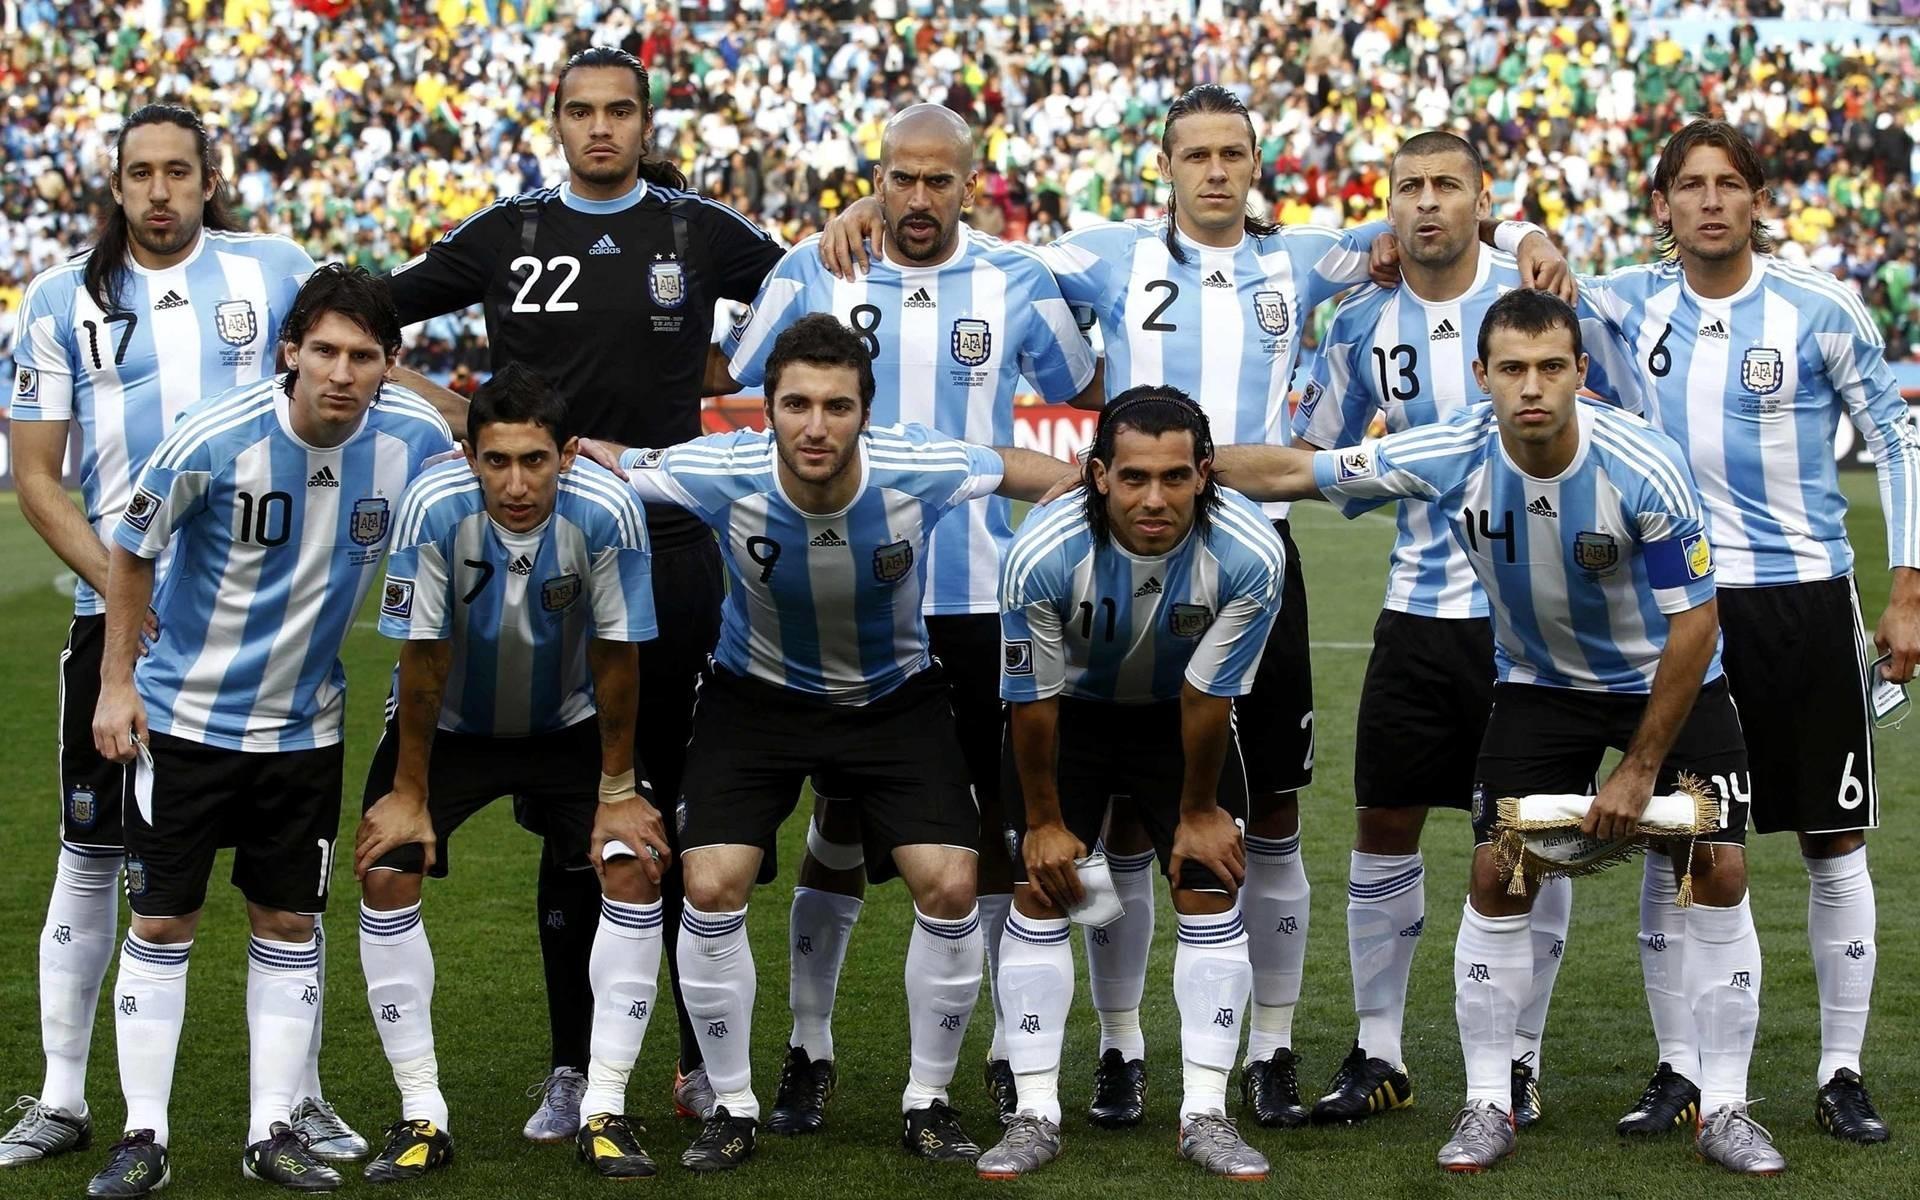 e441e925e15 1920x1200 Argentina National Football Team HD Wallpapers 2015 - Wallpapers  Mela